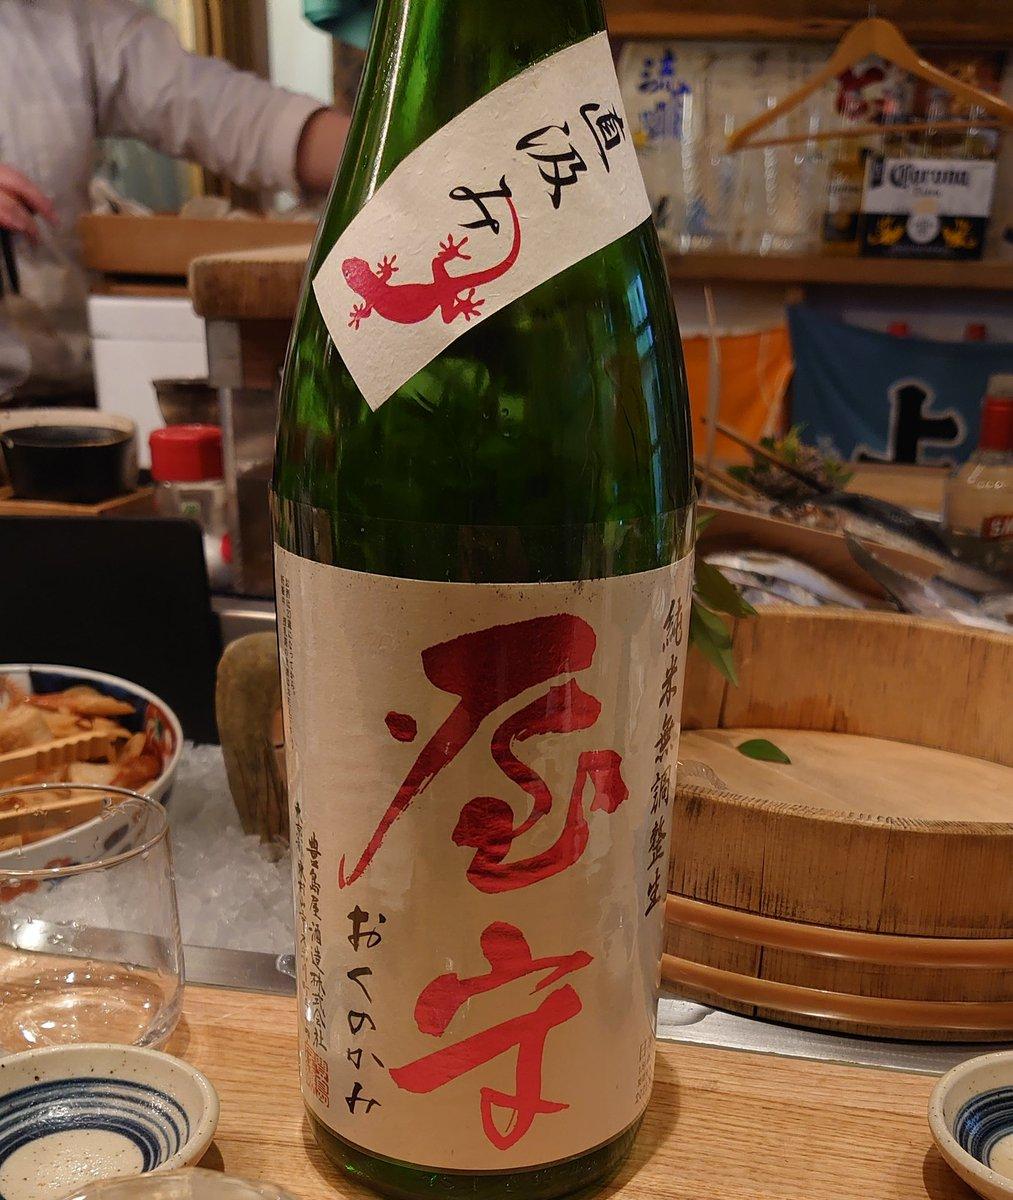 test ツイッターメディア - ソロ2軒目!日本酒注いでもらった☺️  うま、、、、屋守うまっ、、、、 東京の酒とは思えないよね、、、、、 https://t.co/vpSPwDgMWP